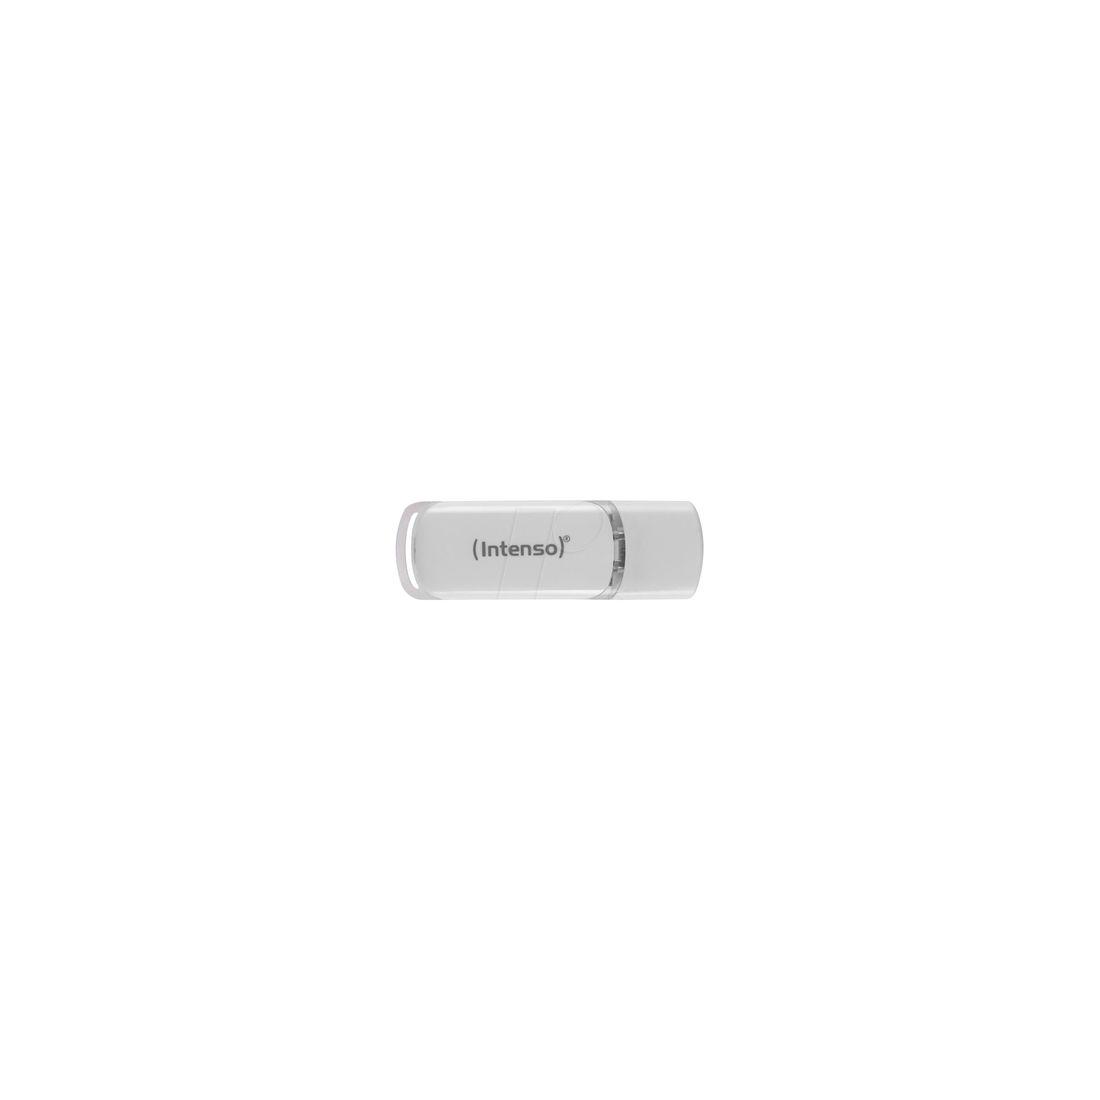 Intenso 3538490 USB 31 Type C Flash Line 64GB